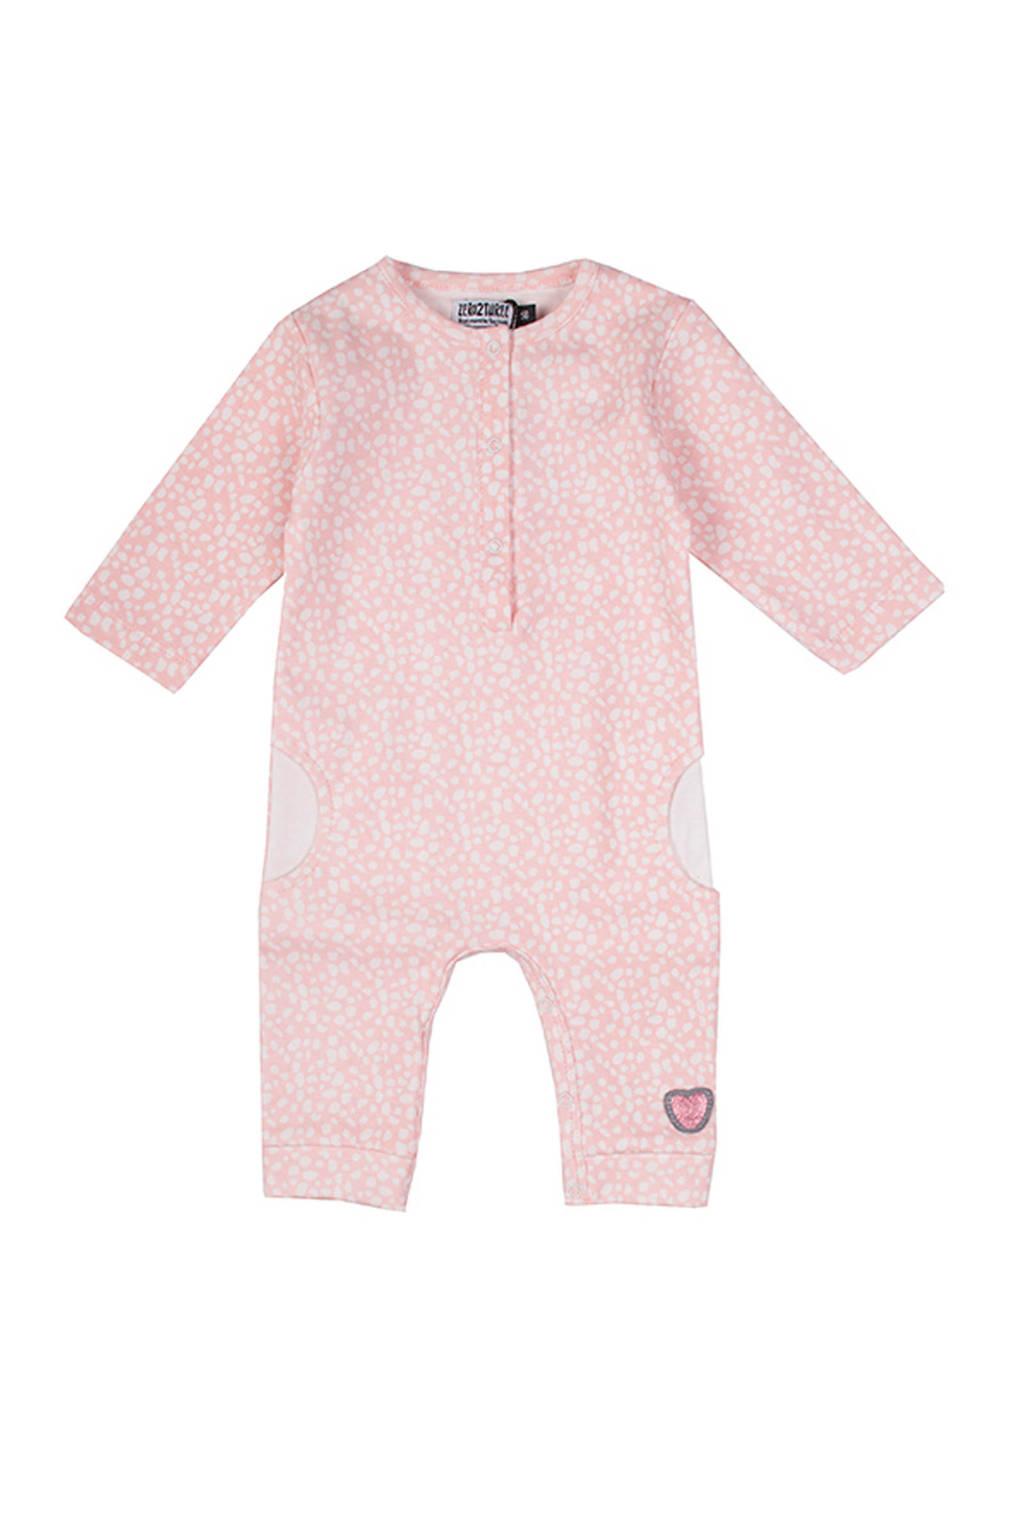 Zero2three baby gestipte boxpak Giraffe roze, Lichtroze